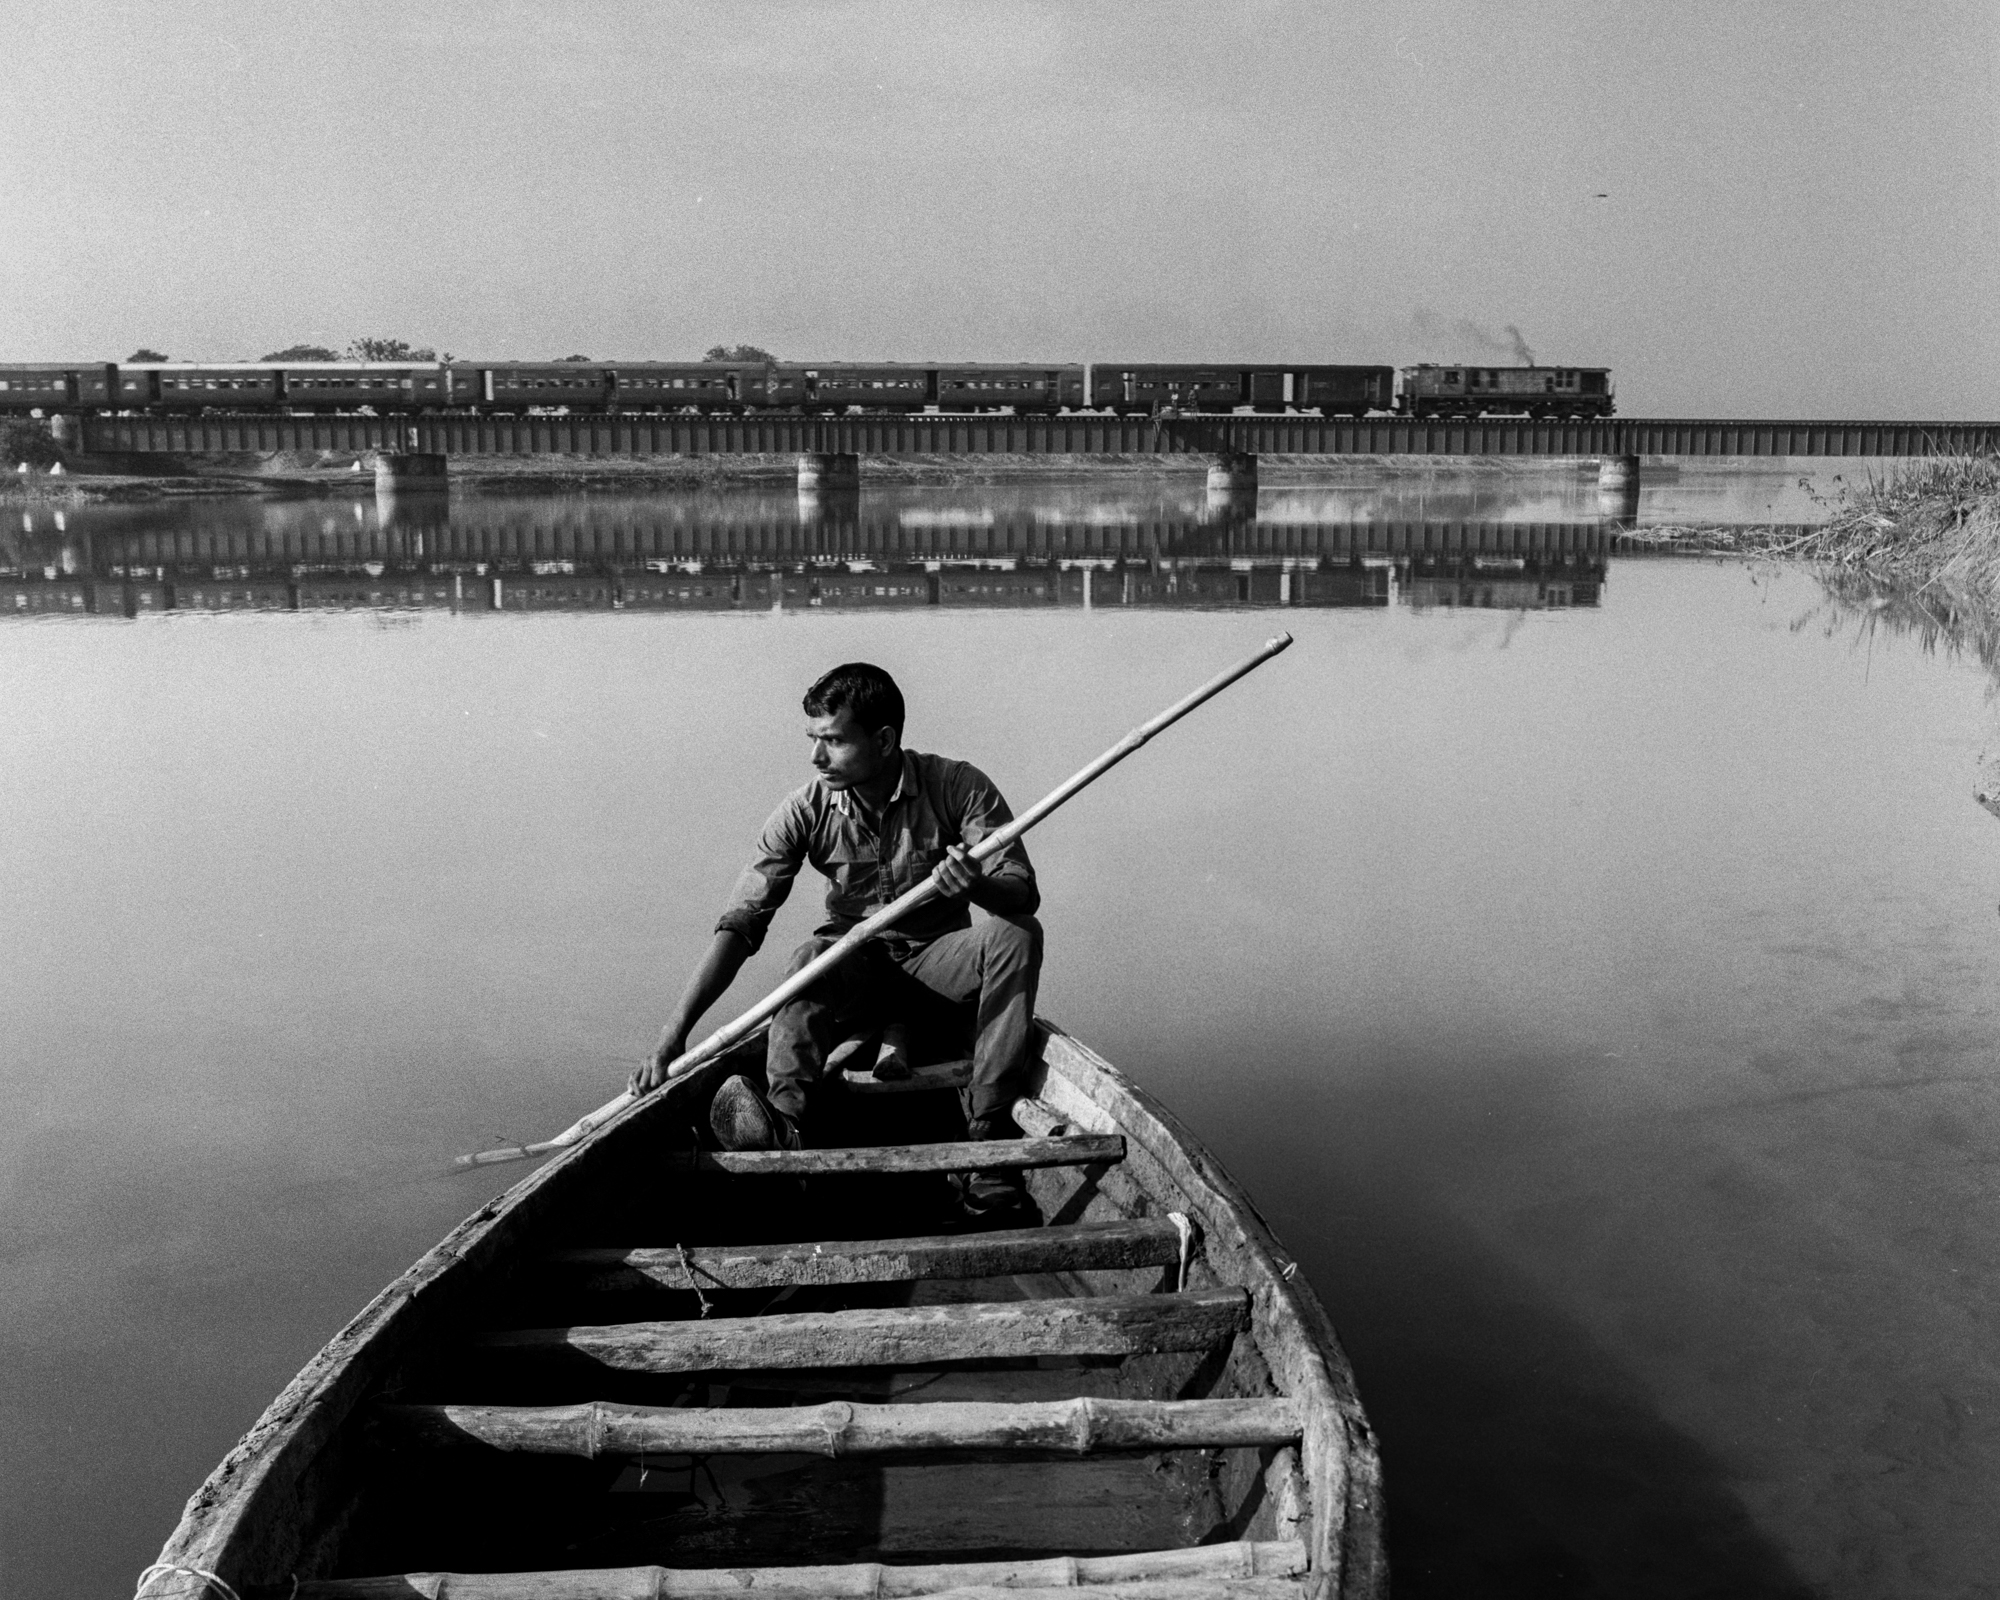 Man in boat with train behind (Pic: Nandakumar Narasimhan)